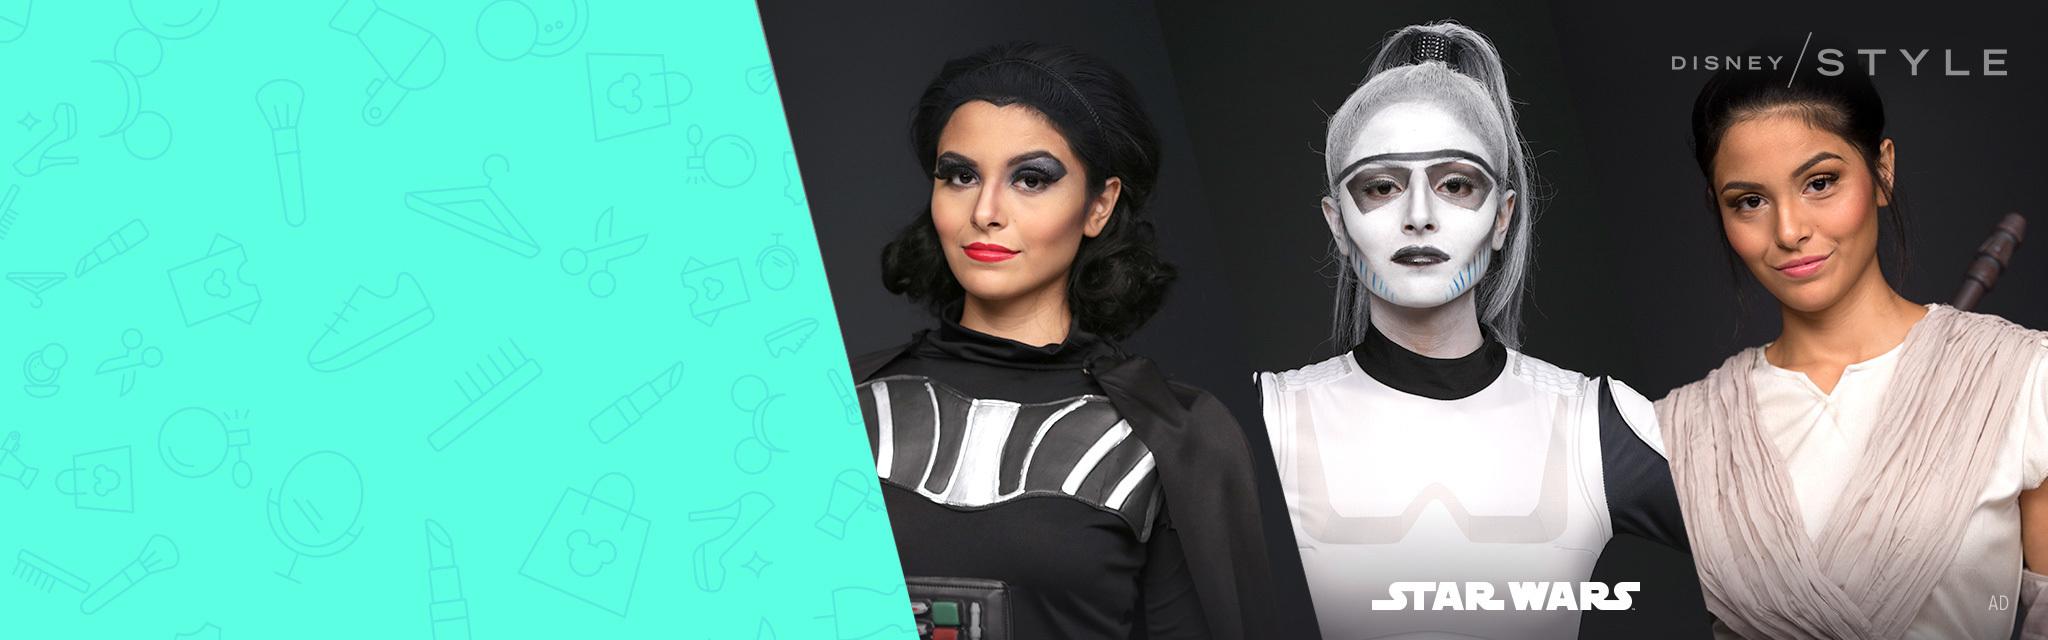 Disney Style - Star Wars Transformation - Hero